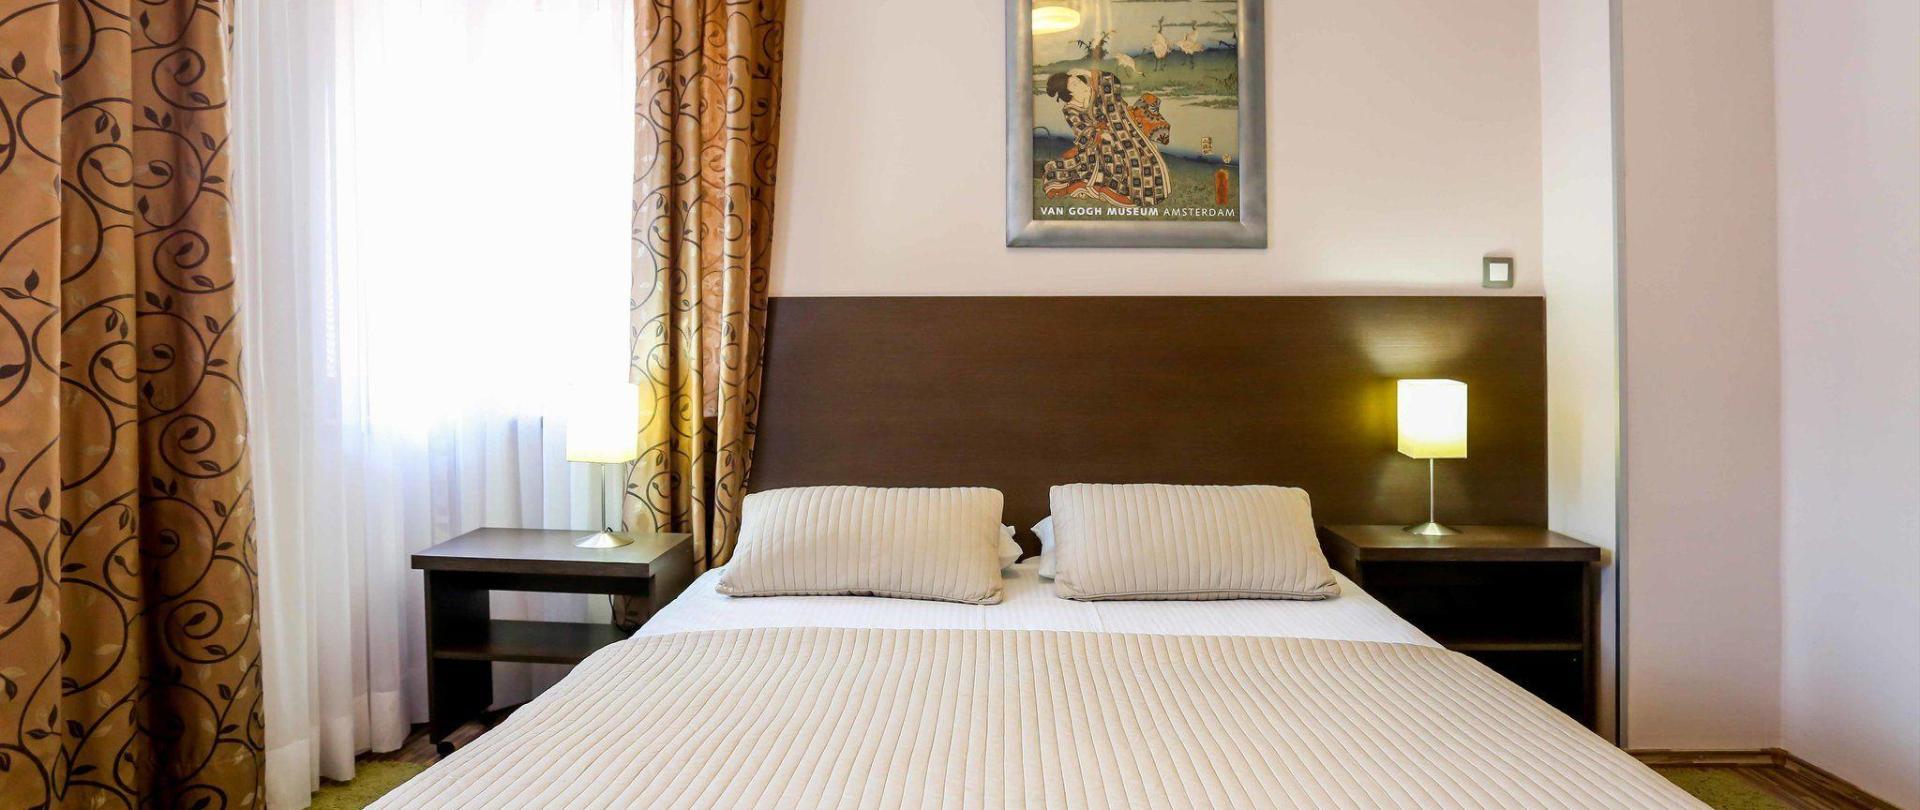 hotel-divan-by-dzenat-drekovic-29-08-2016-14.jpg